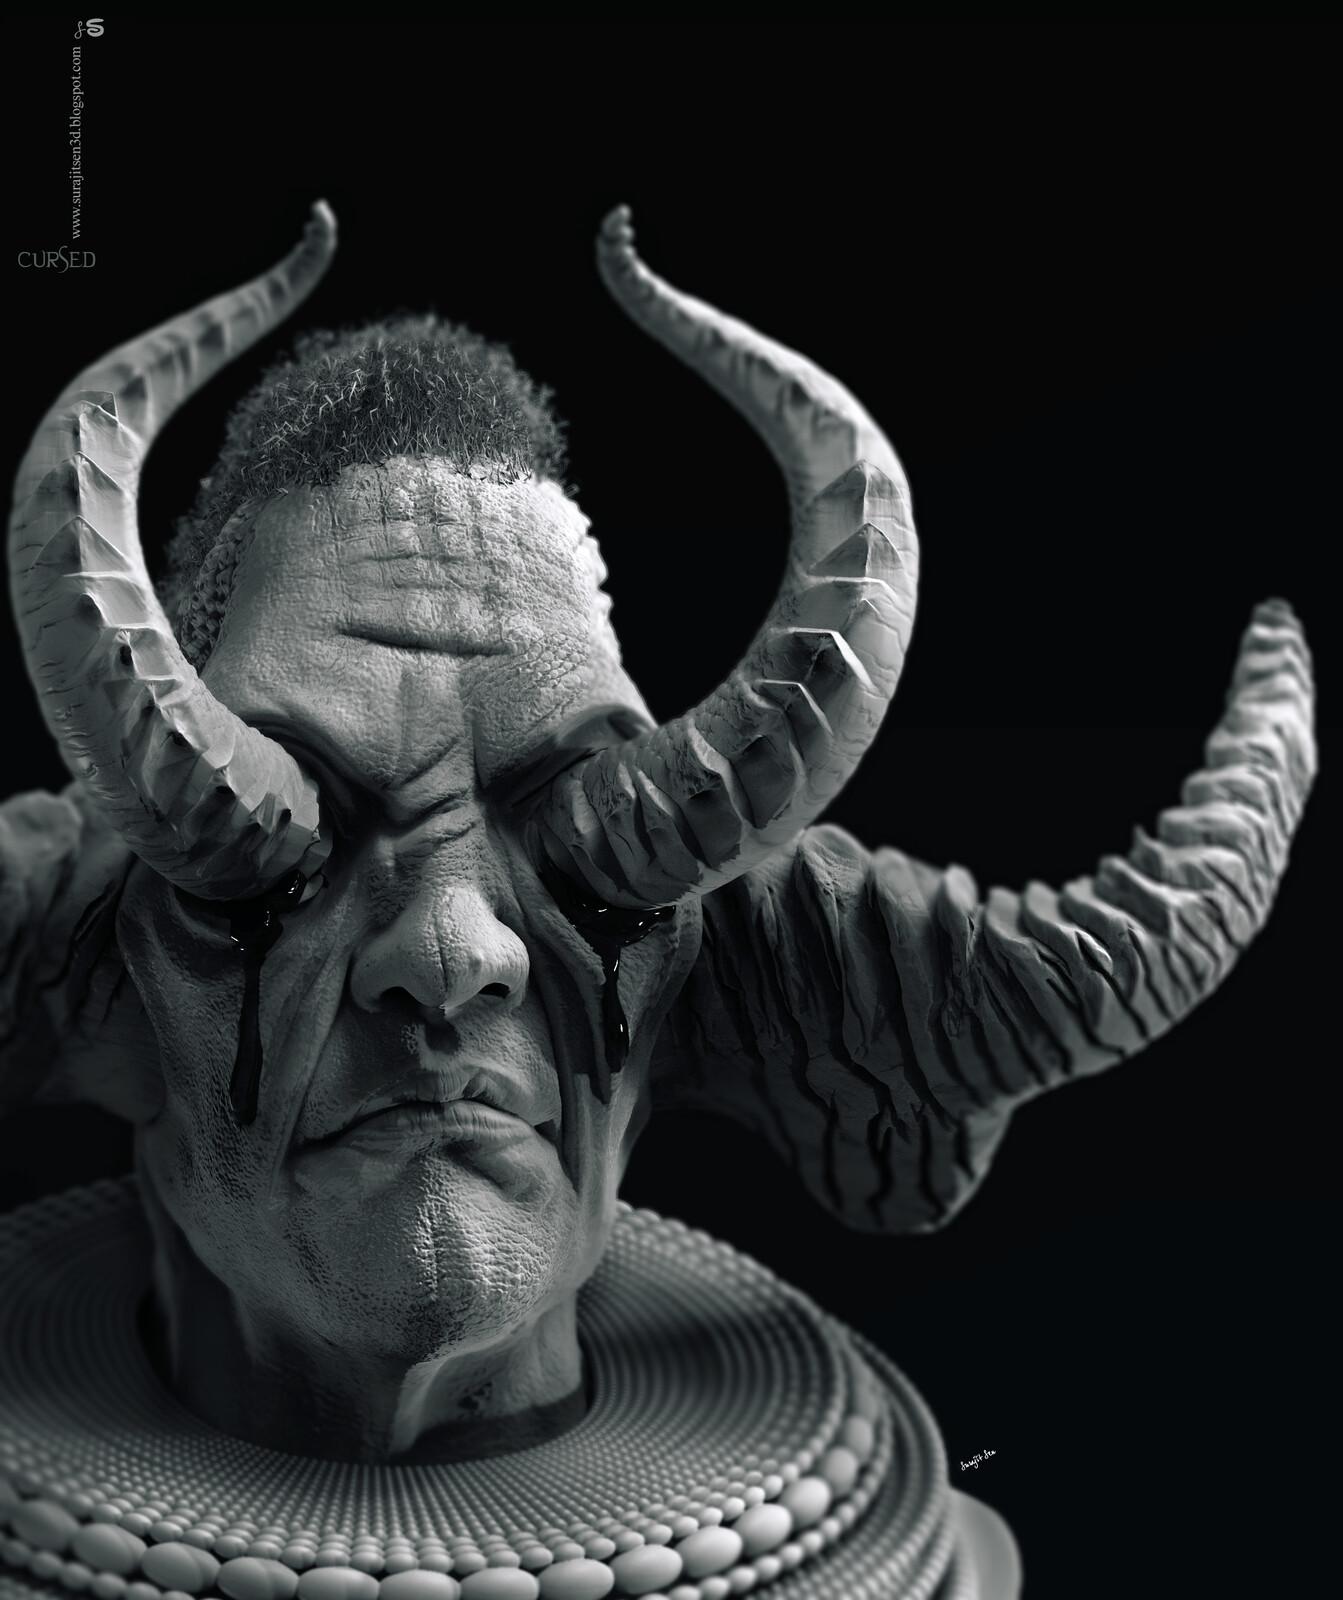 Cursed2.2 Updated version Free time Digital Sculpture Background music- #hanszimmermusic